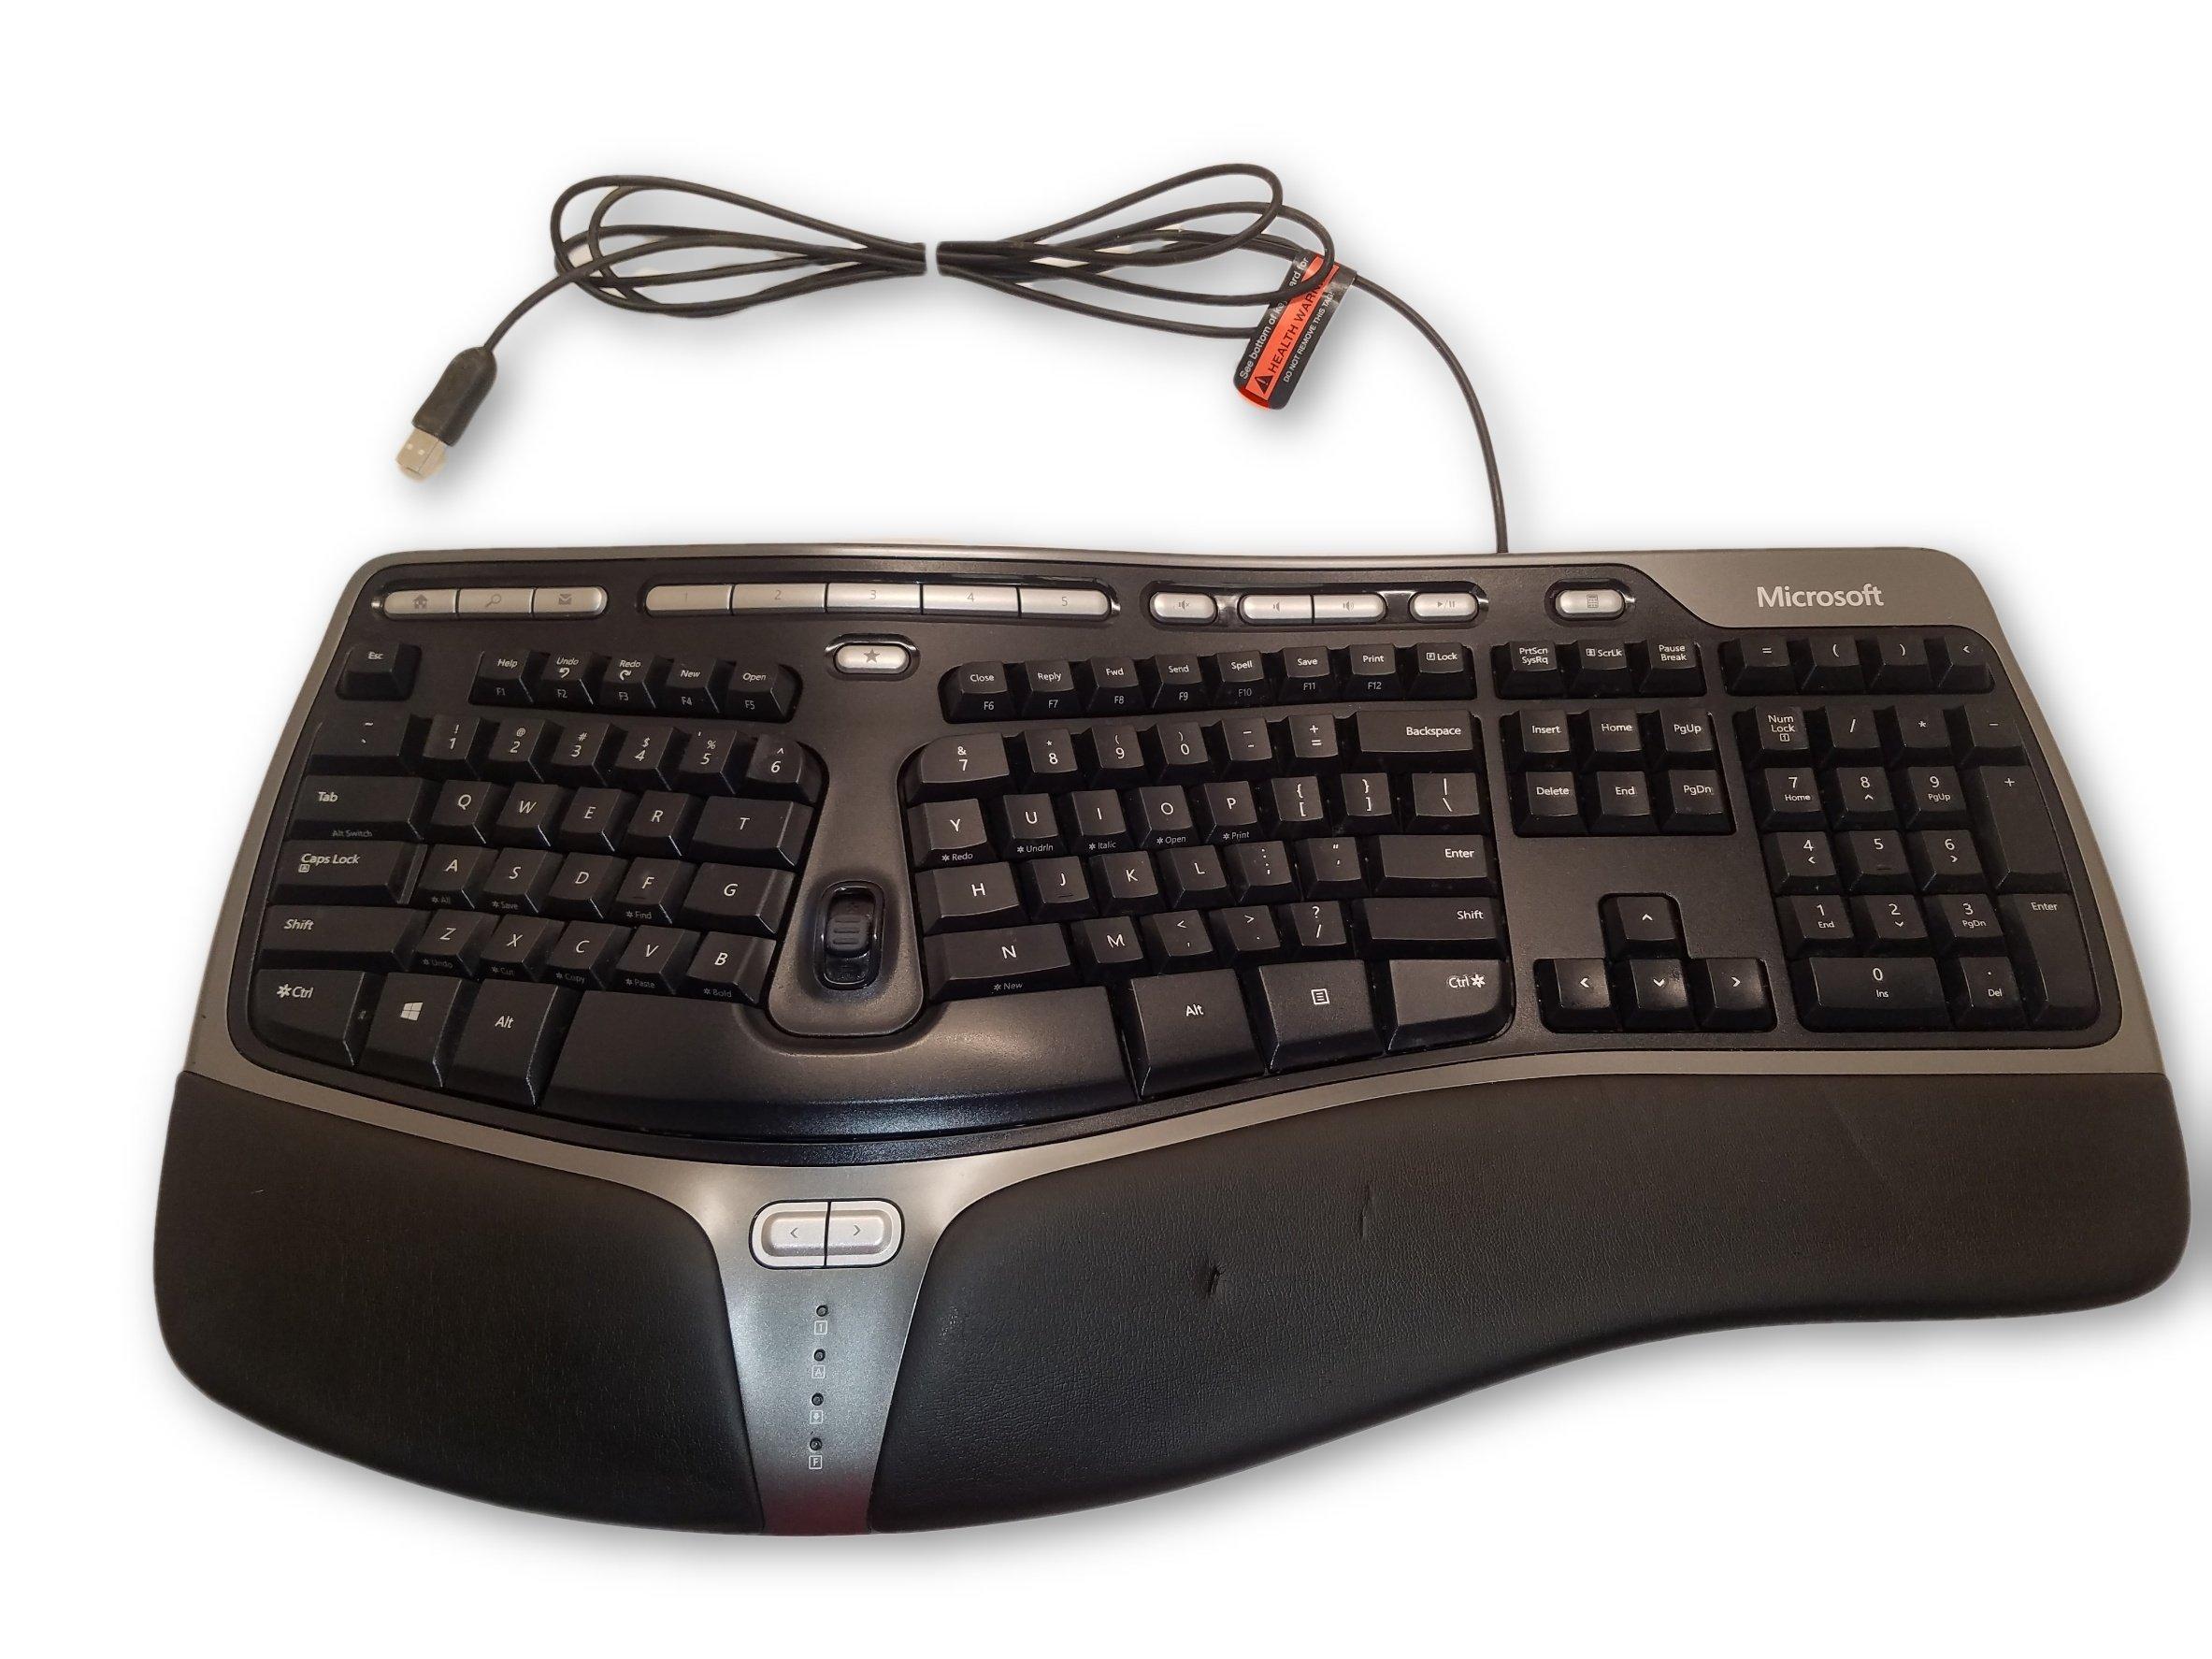 Microsoft Natural Ergonomic Keyboard 4000 V1 0 Keyboard Ergonomics Microsoft